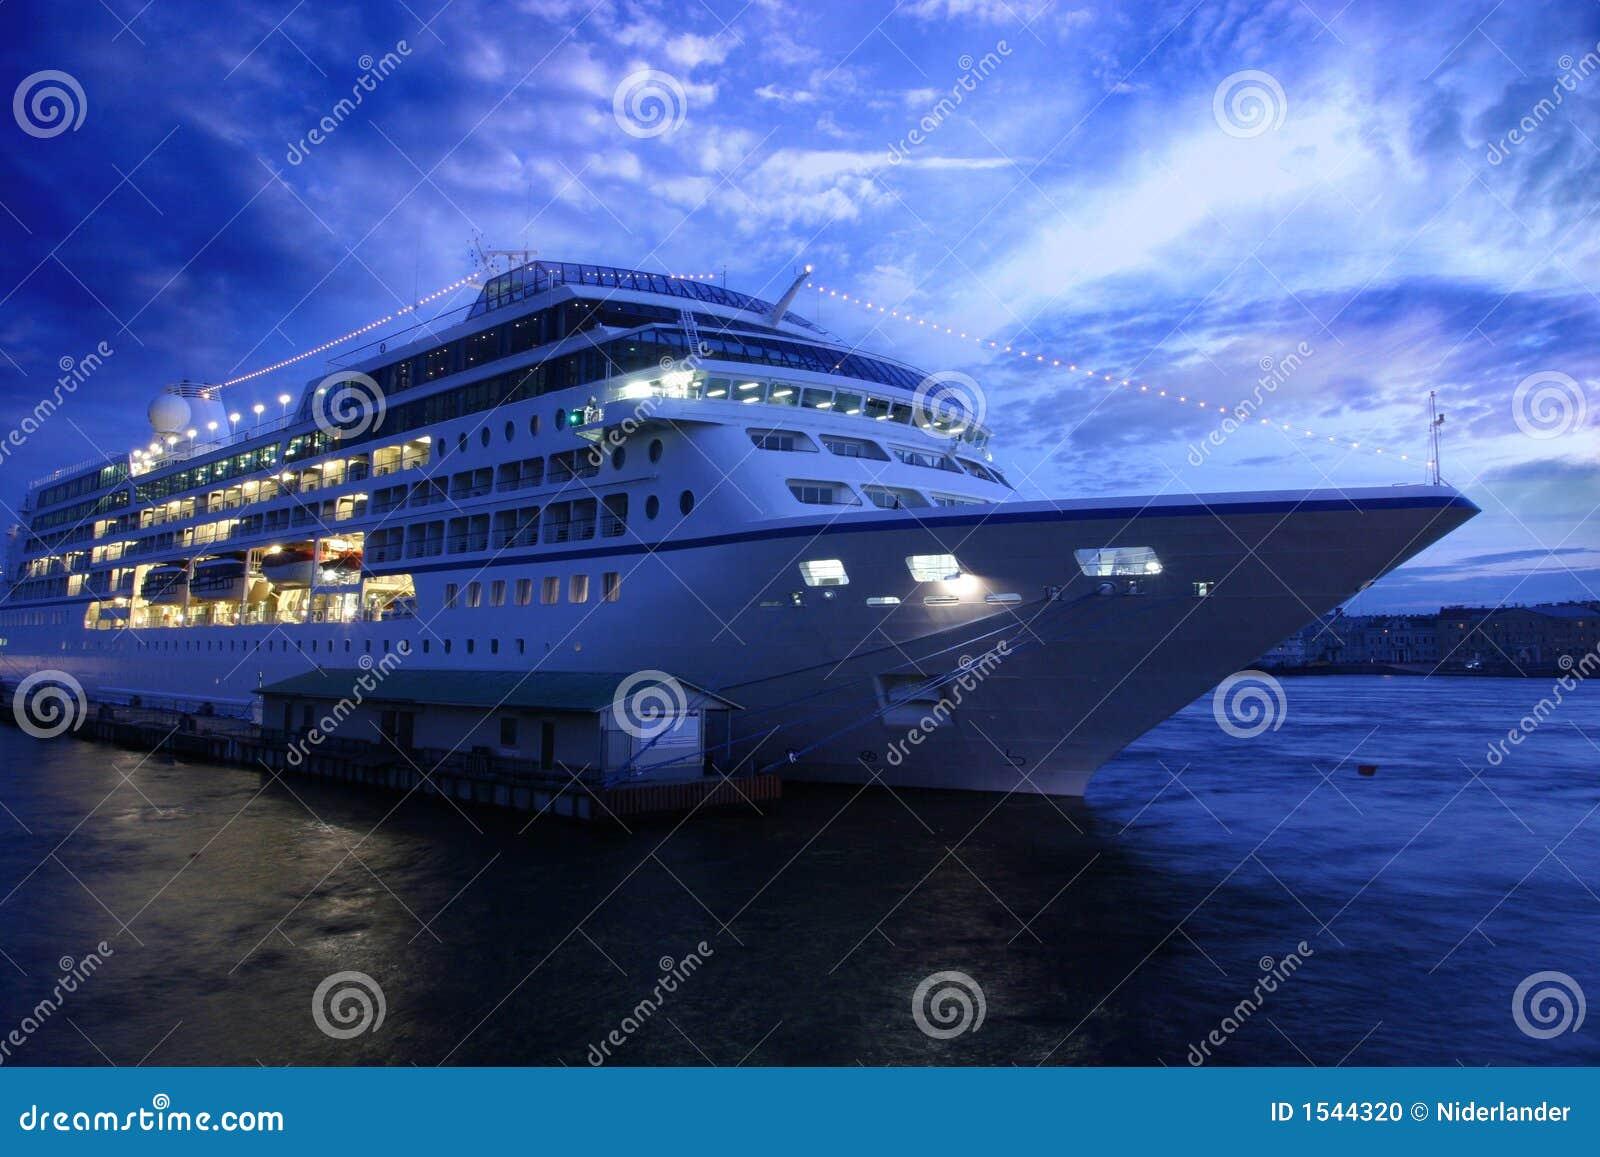 Forro de oceano e noite azul